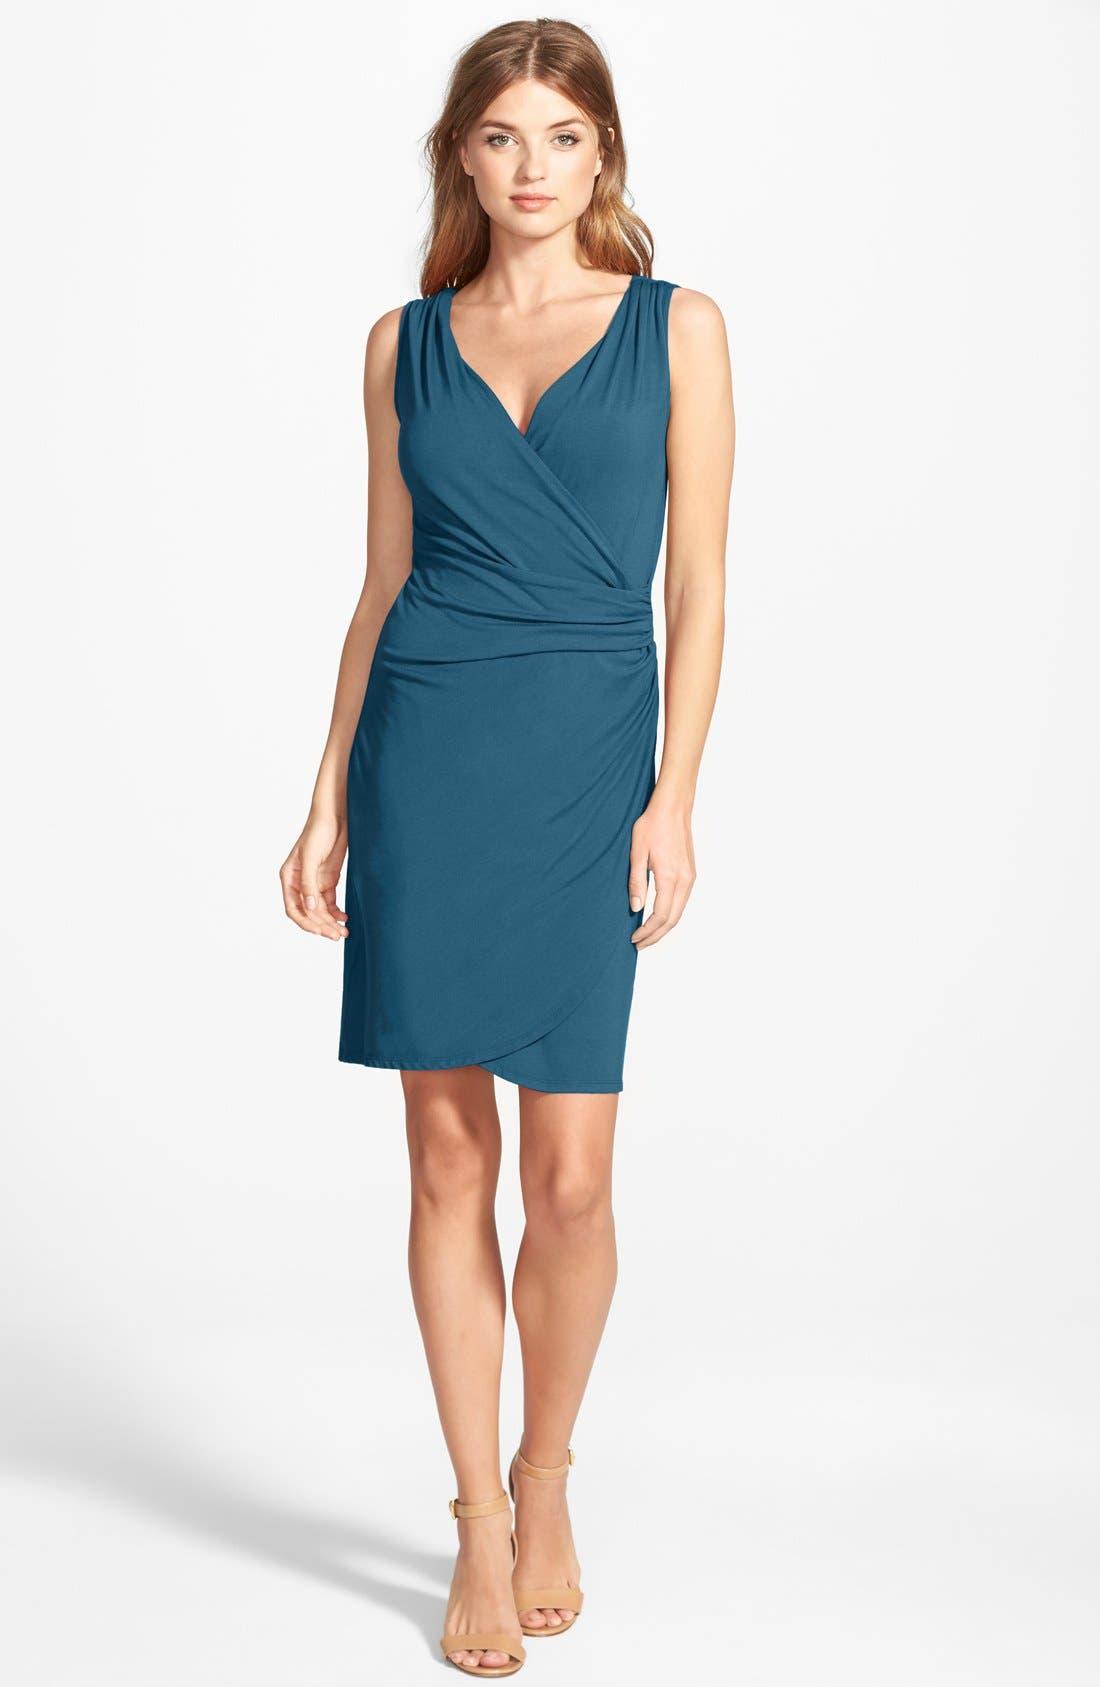 Main Image - Tommy Bahama 'Tambour' Sleeveless Gathered Jersey Dress